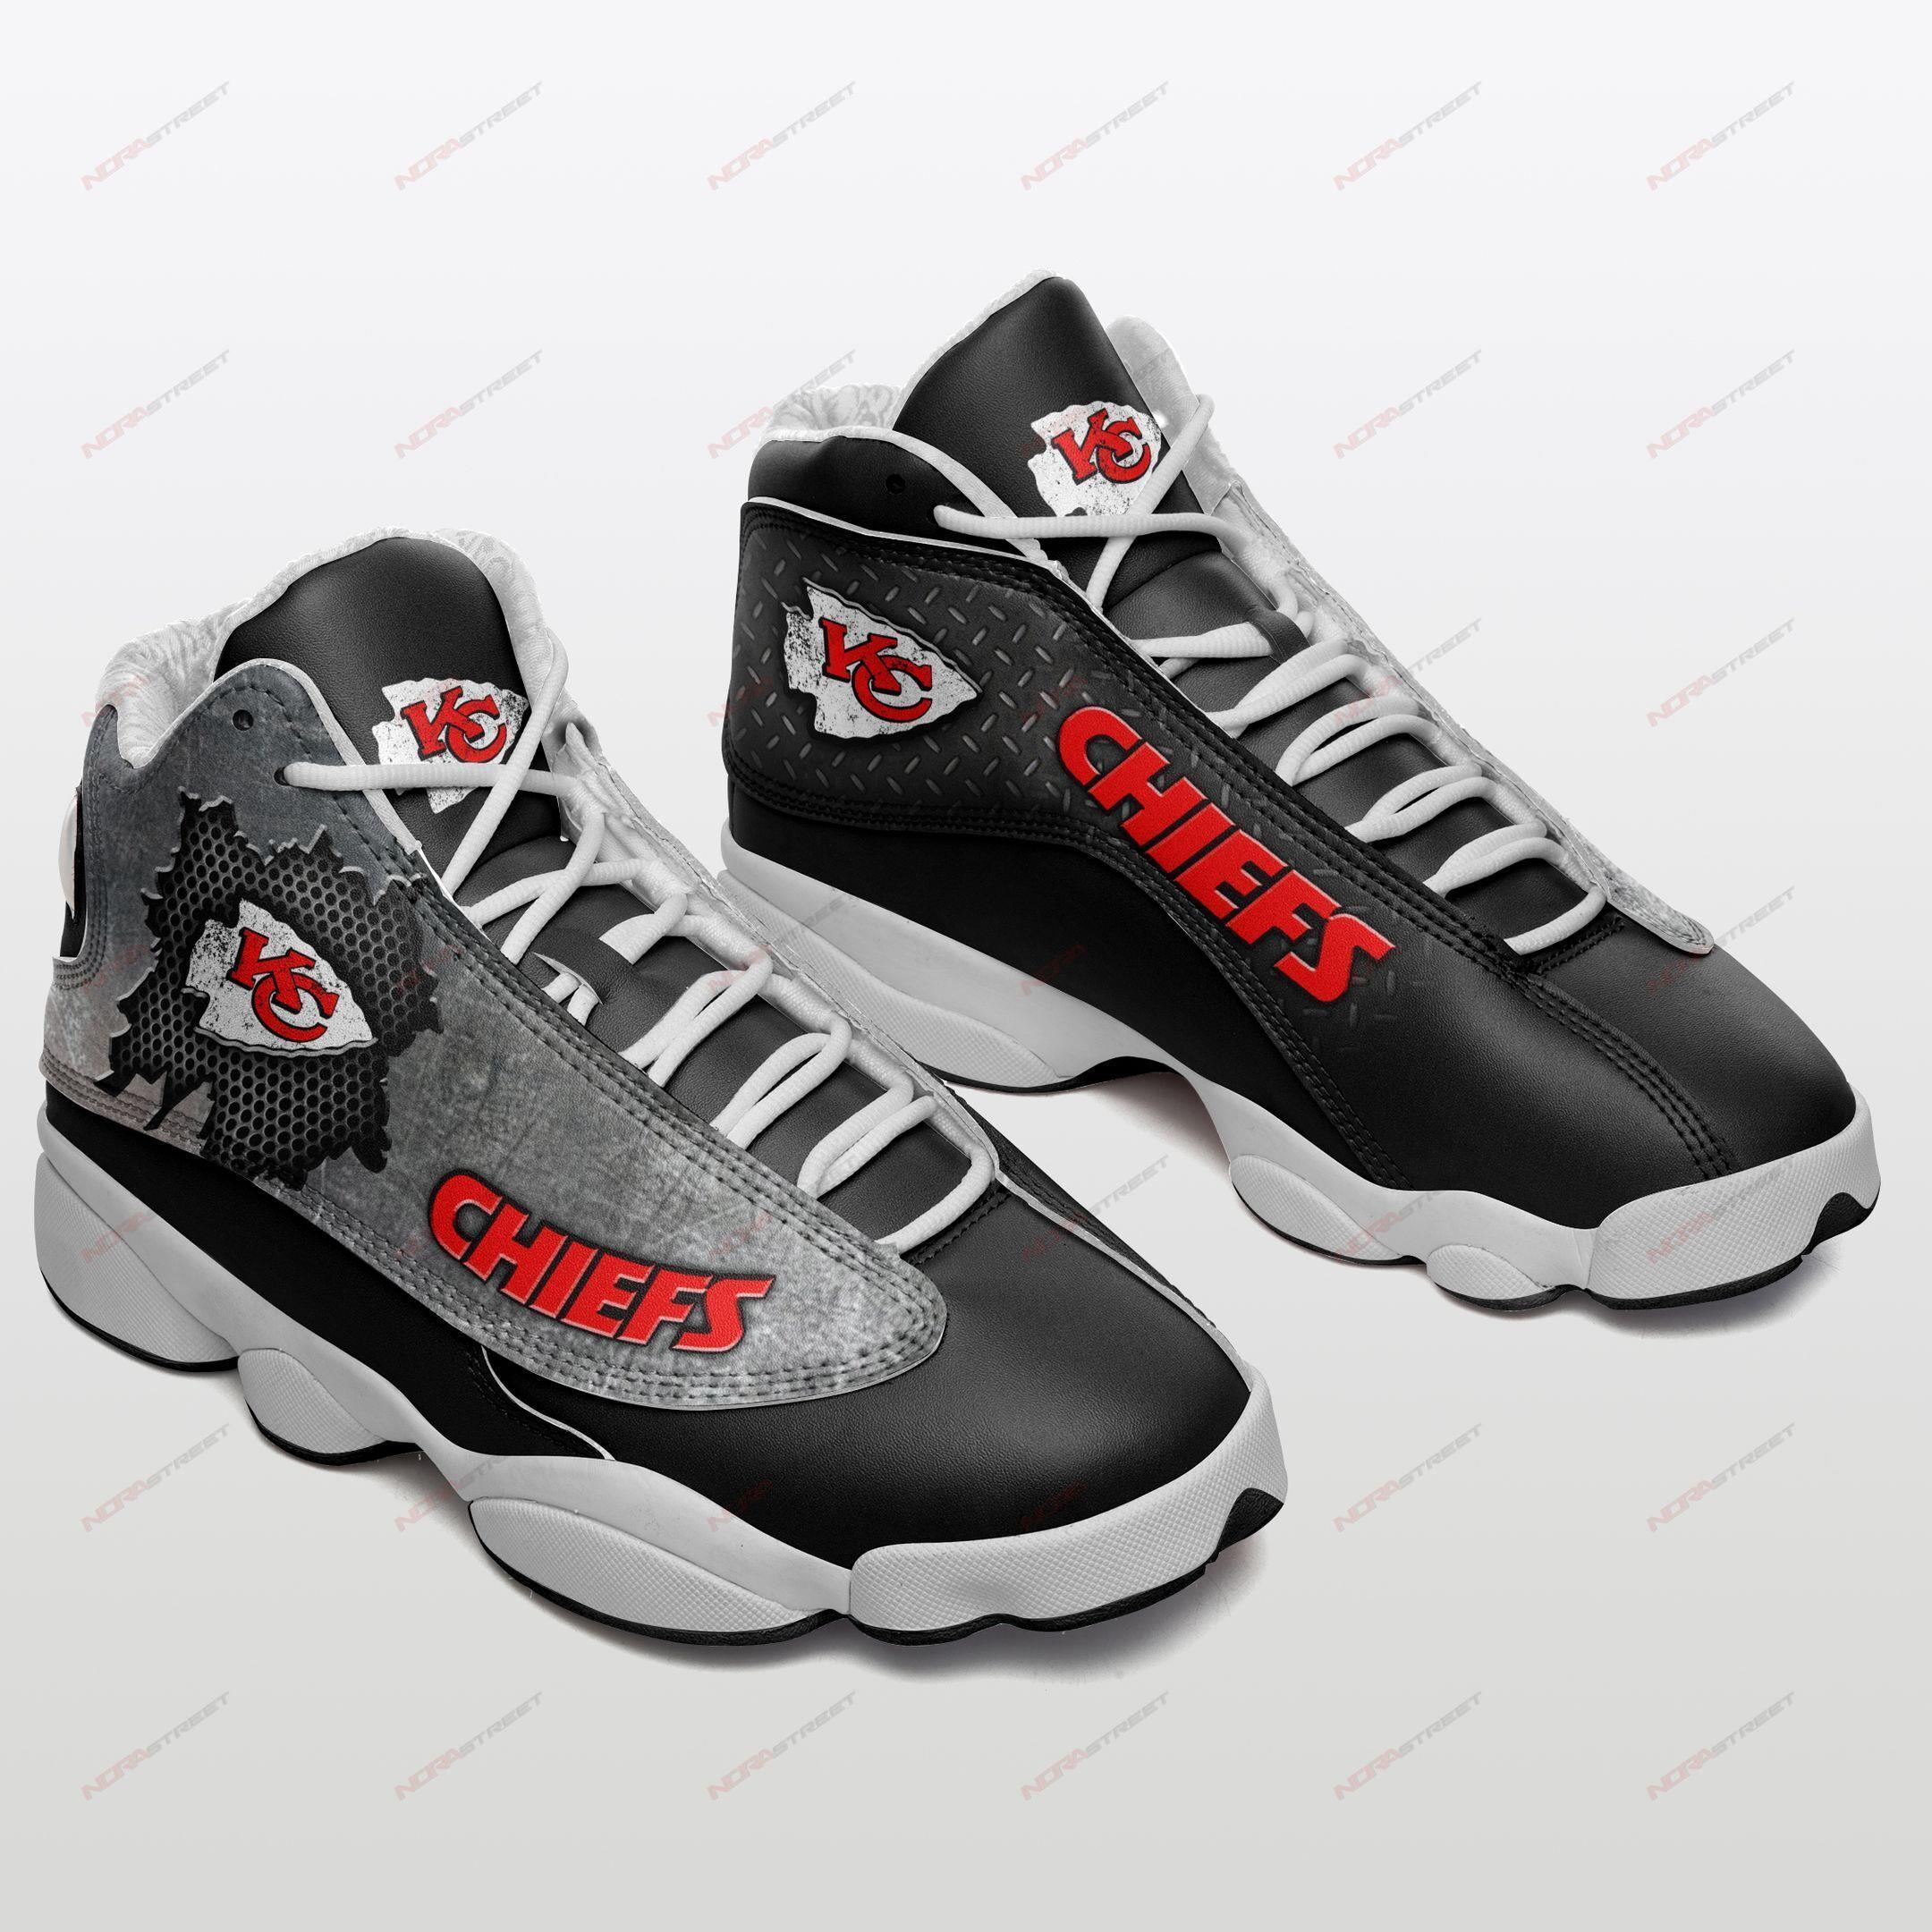 Kansas City Chiefs Air Jordan 13 Sneakers Sport Shoes Full Size